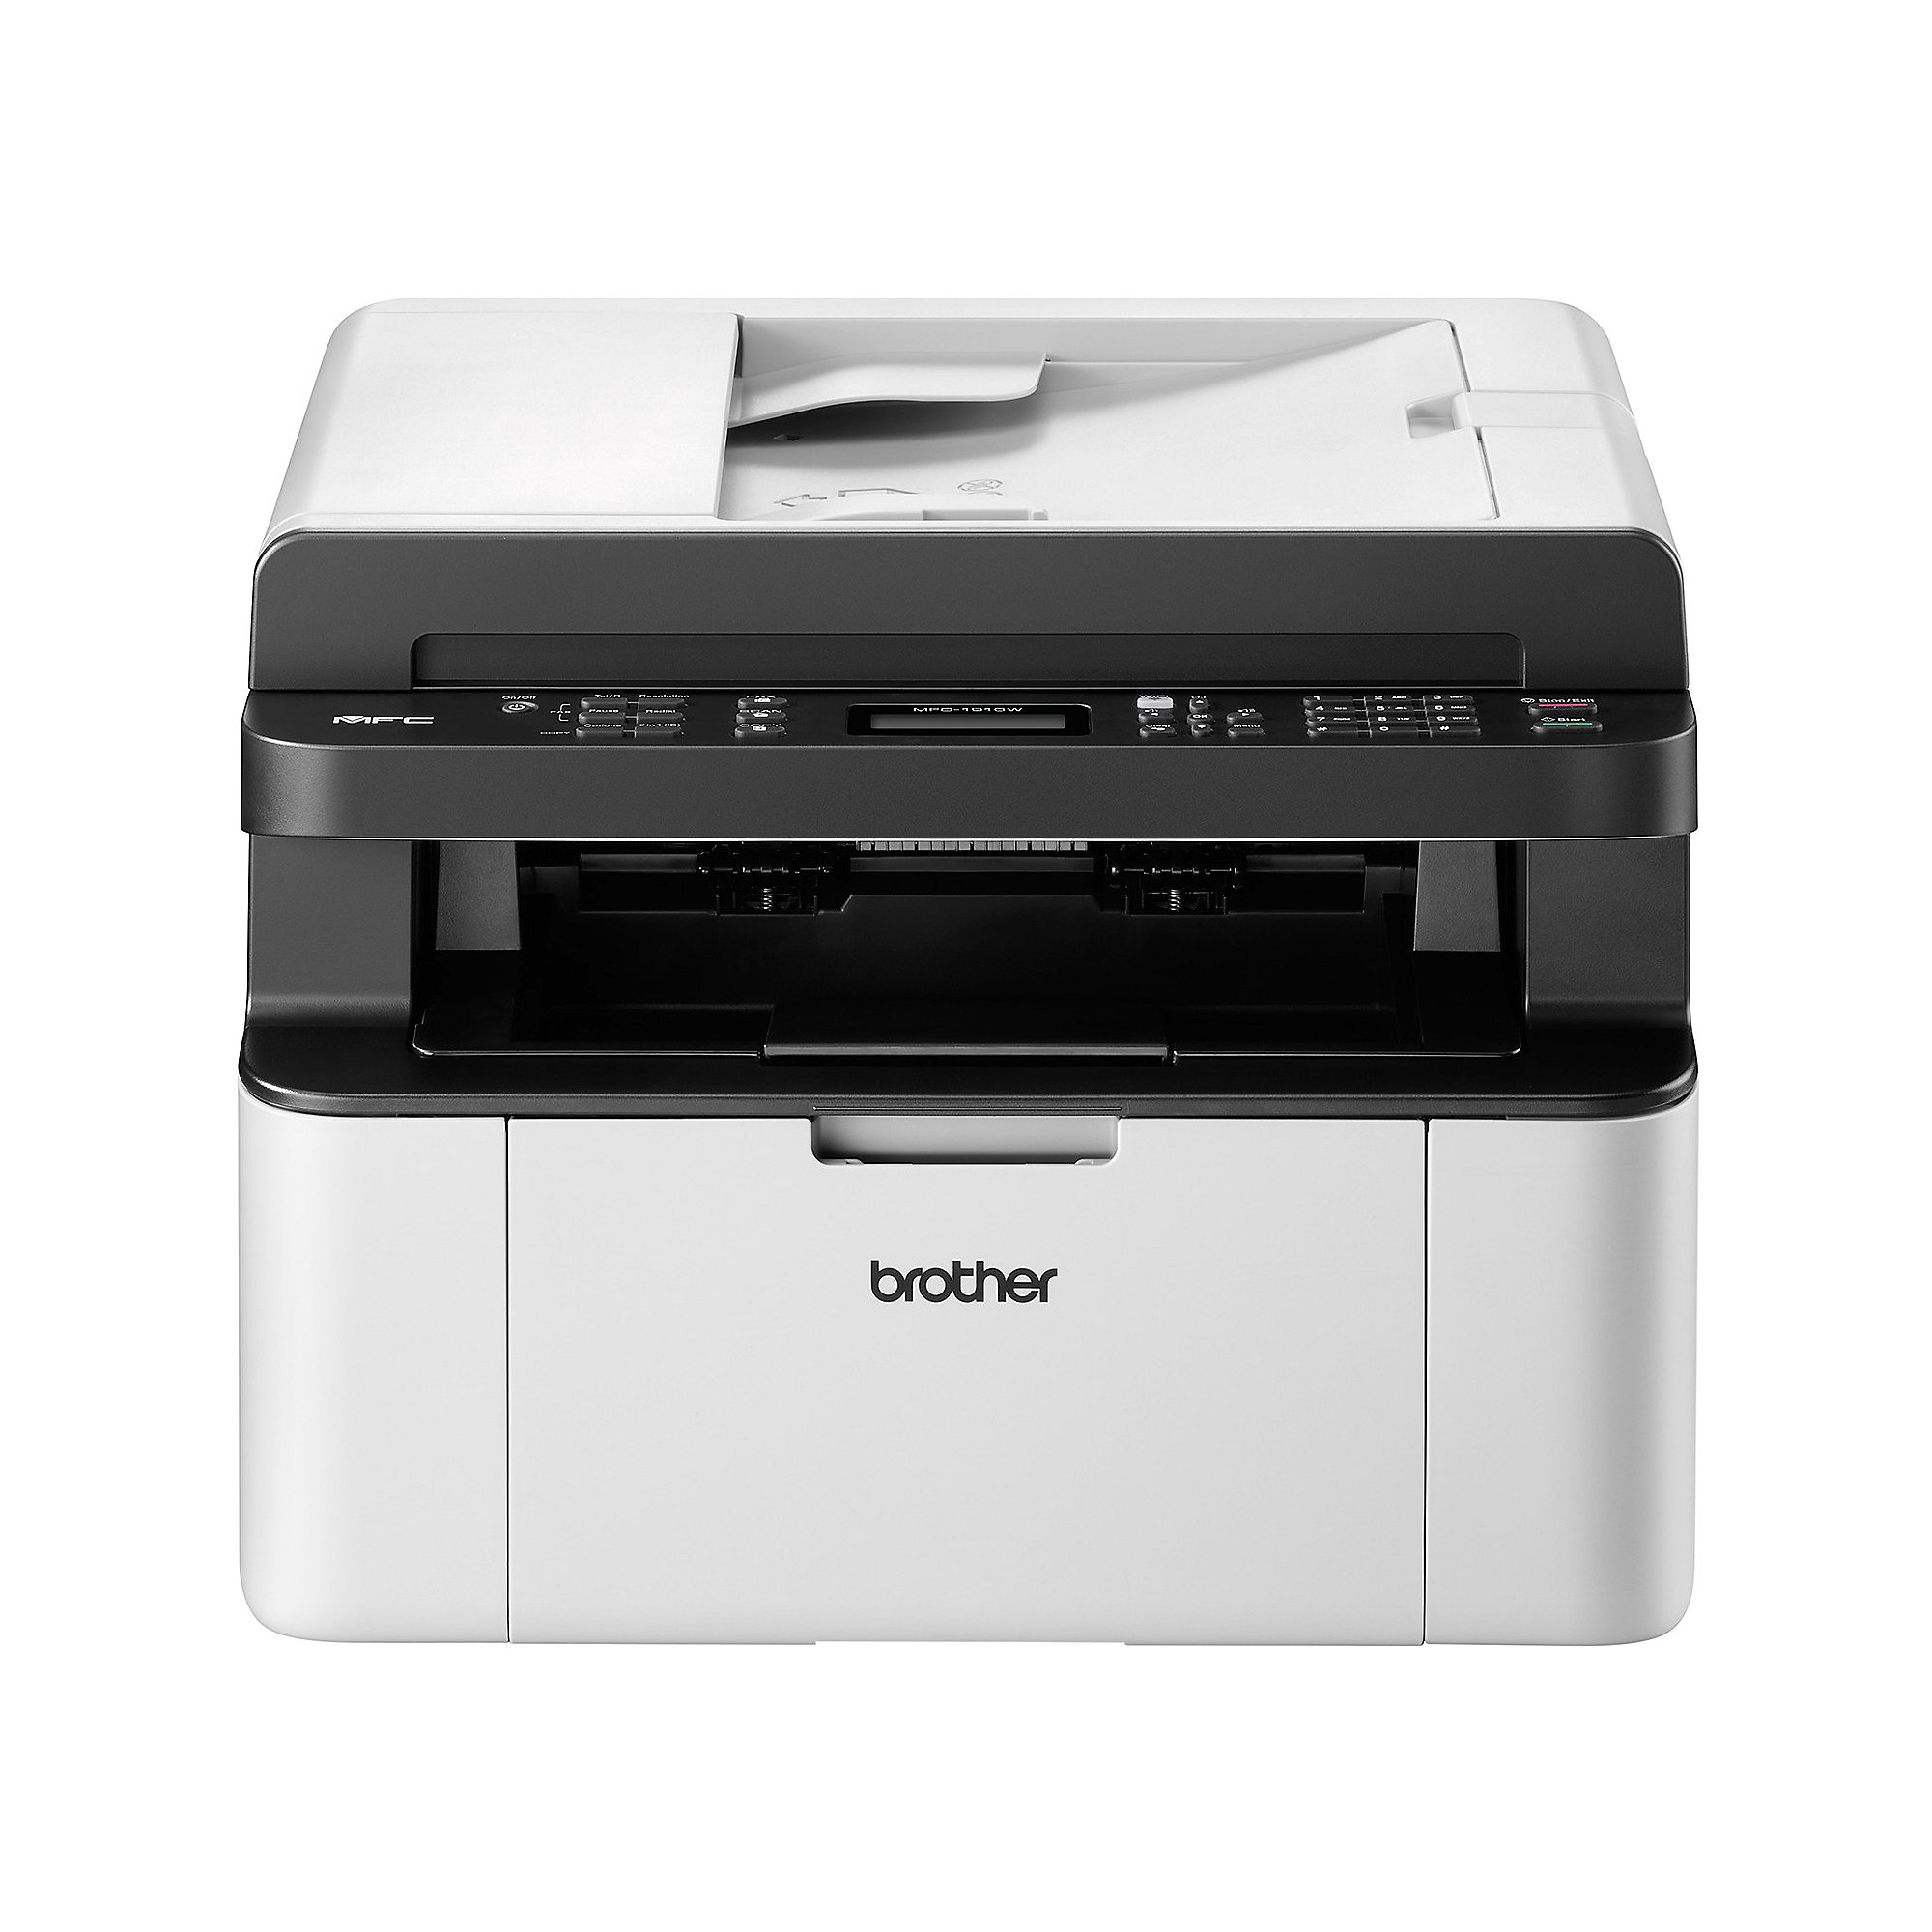 brother mfc 1910w s w laser multifunktionsdrucker scanner kopierer fax wlan cyberport. Black Bedroom Furniture Sets. Home Design Ideas